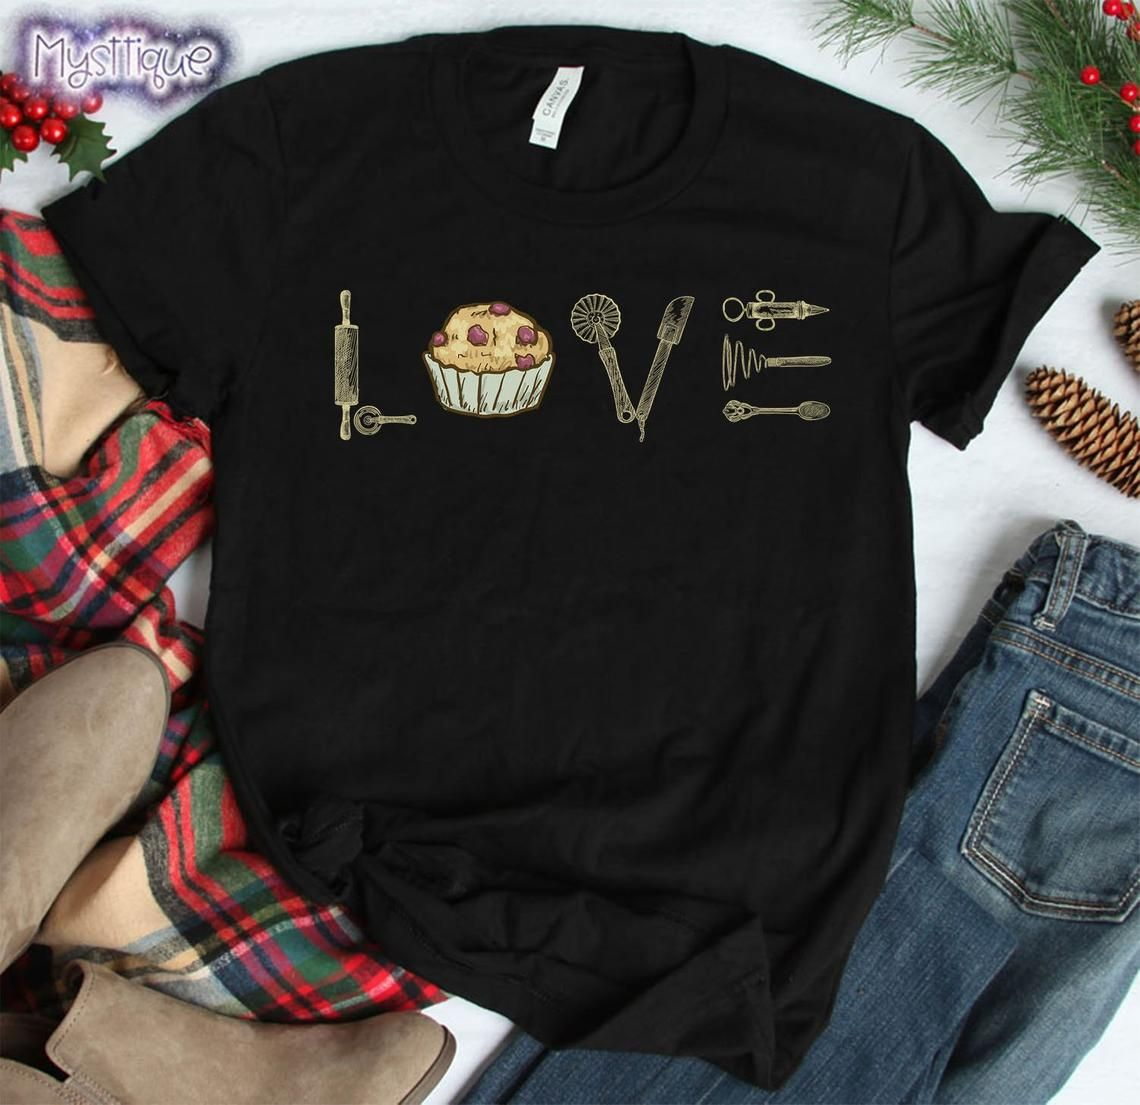 Cupcake Shirt 2021 Shirt Baker Shirt Baking Shirt Gifts for Bakers Valentine Shirt Cute Cupcake Shirt Matching Couple Shirts